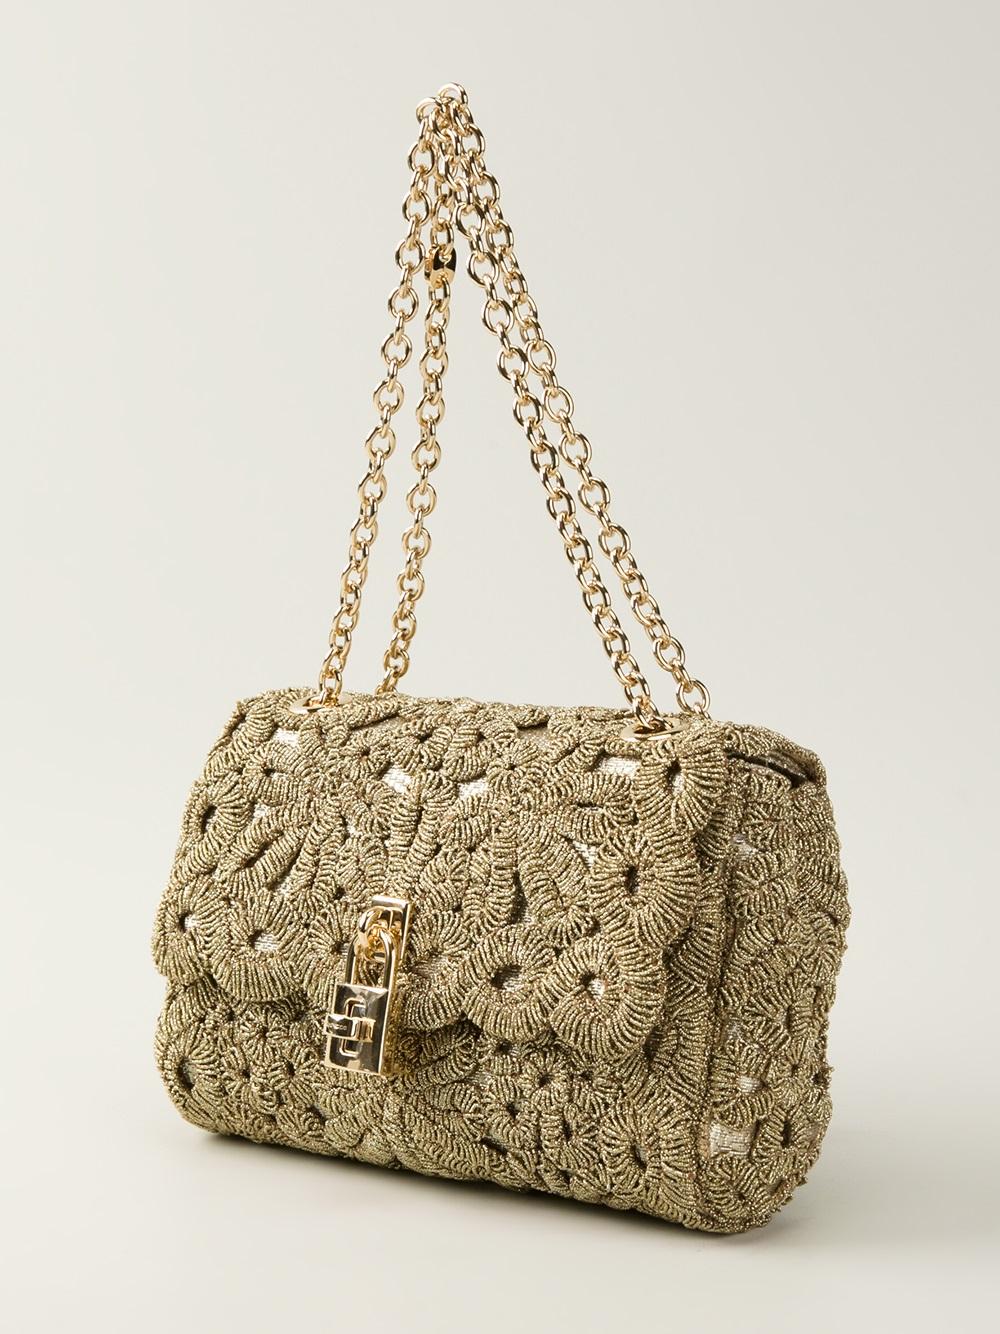 Lyst - Dolce   Gabbana Crochet Padlock Shoulder Bag in Metallic 26c82419f6